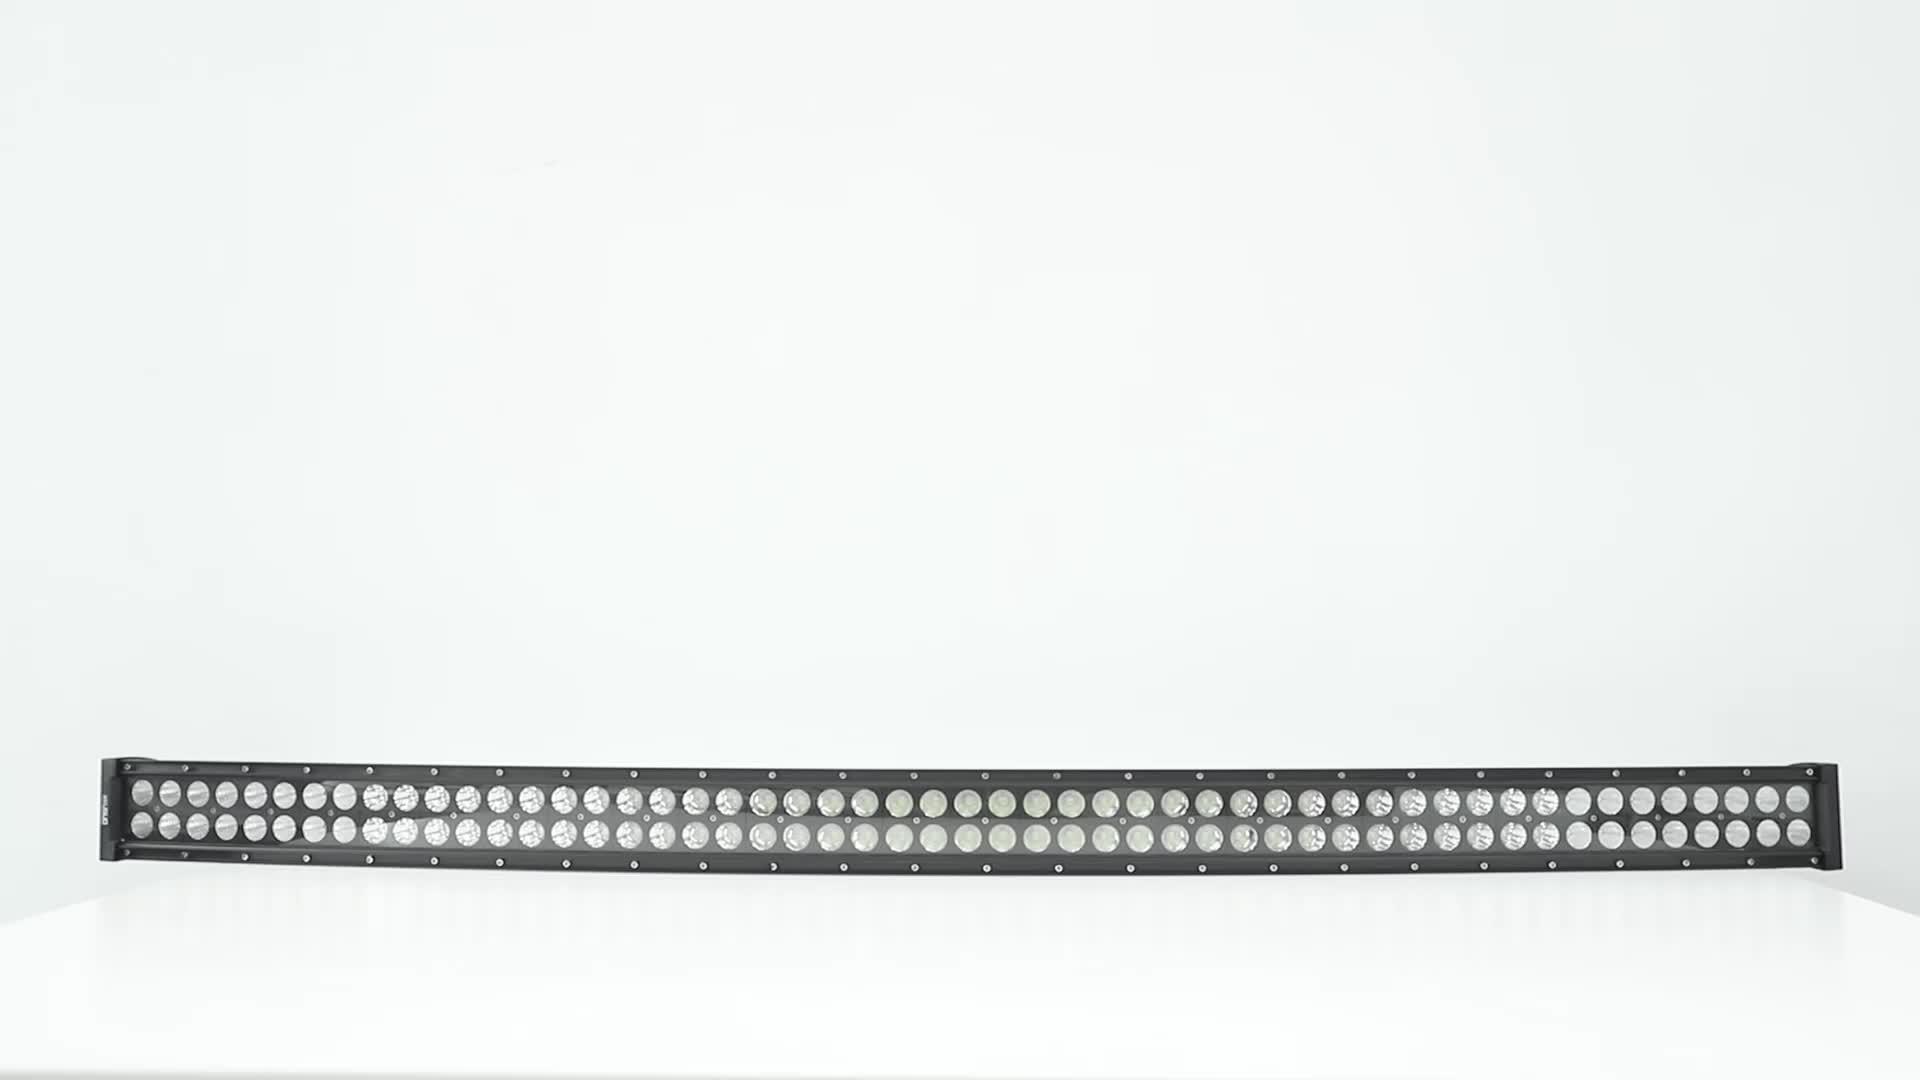 Super Bright 12V LED Offroad Driving Light 300W 50 นิ้วโค้ง LED Light Bar